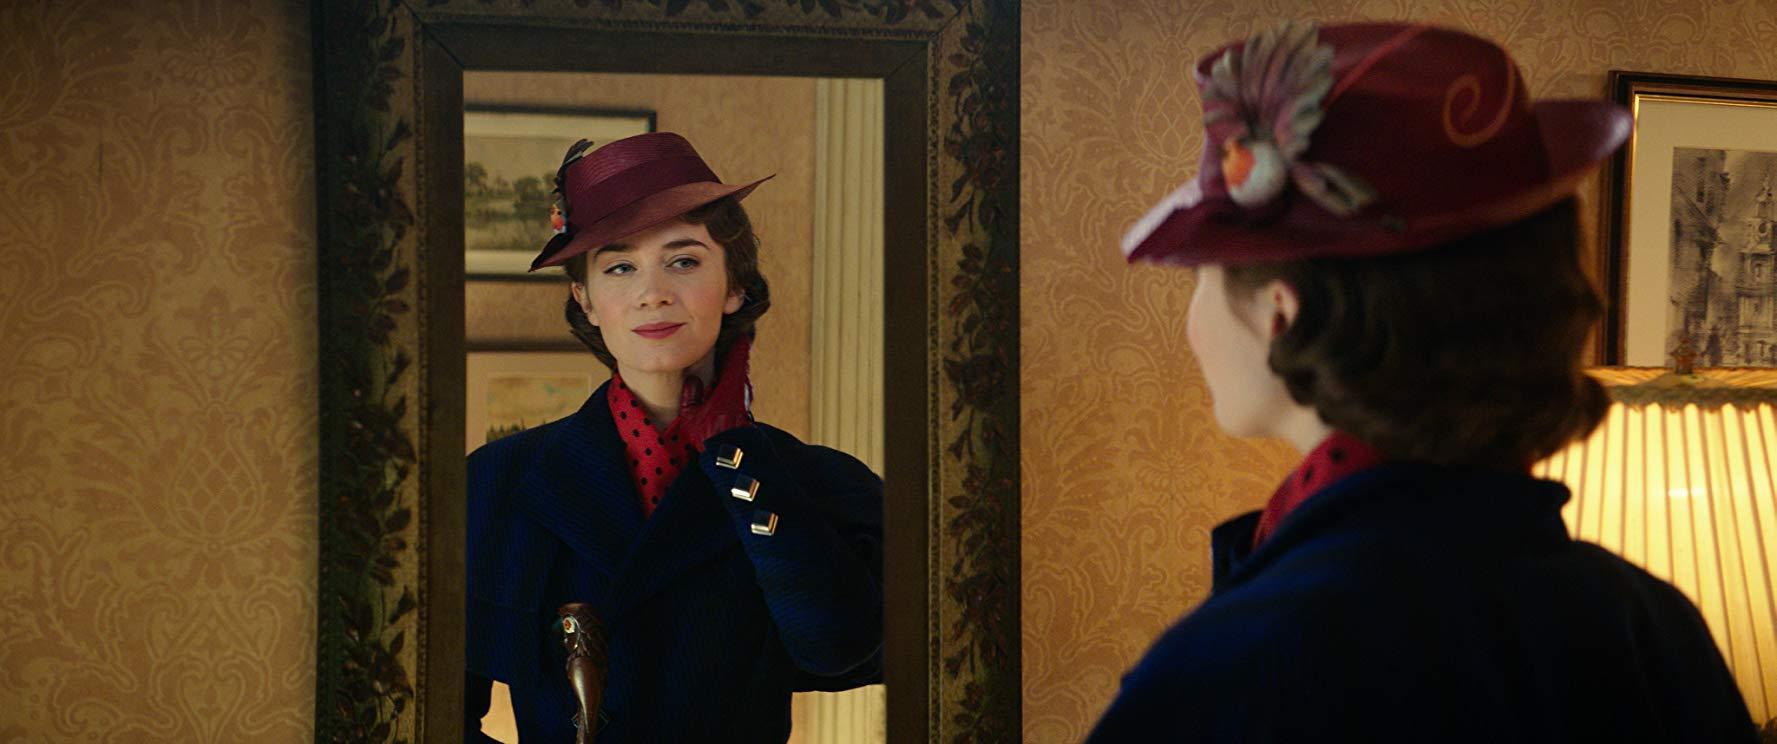 Mary Poppins Returns – Marketing Recap